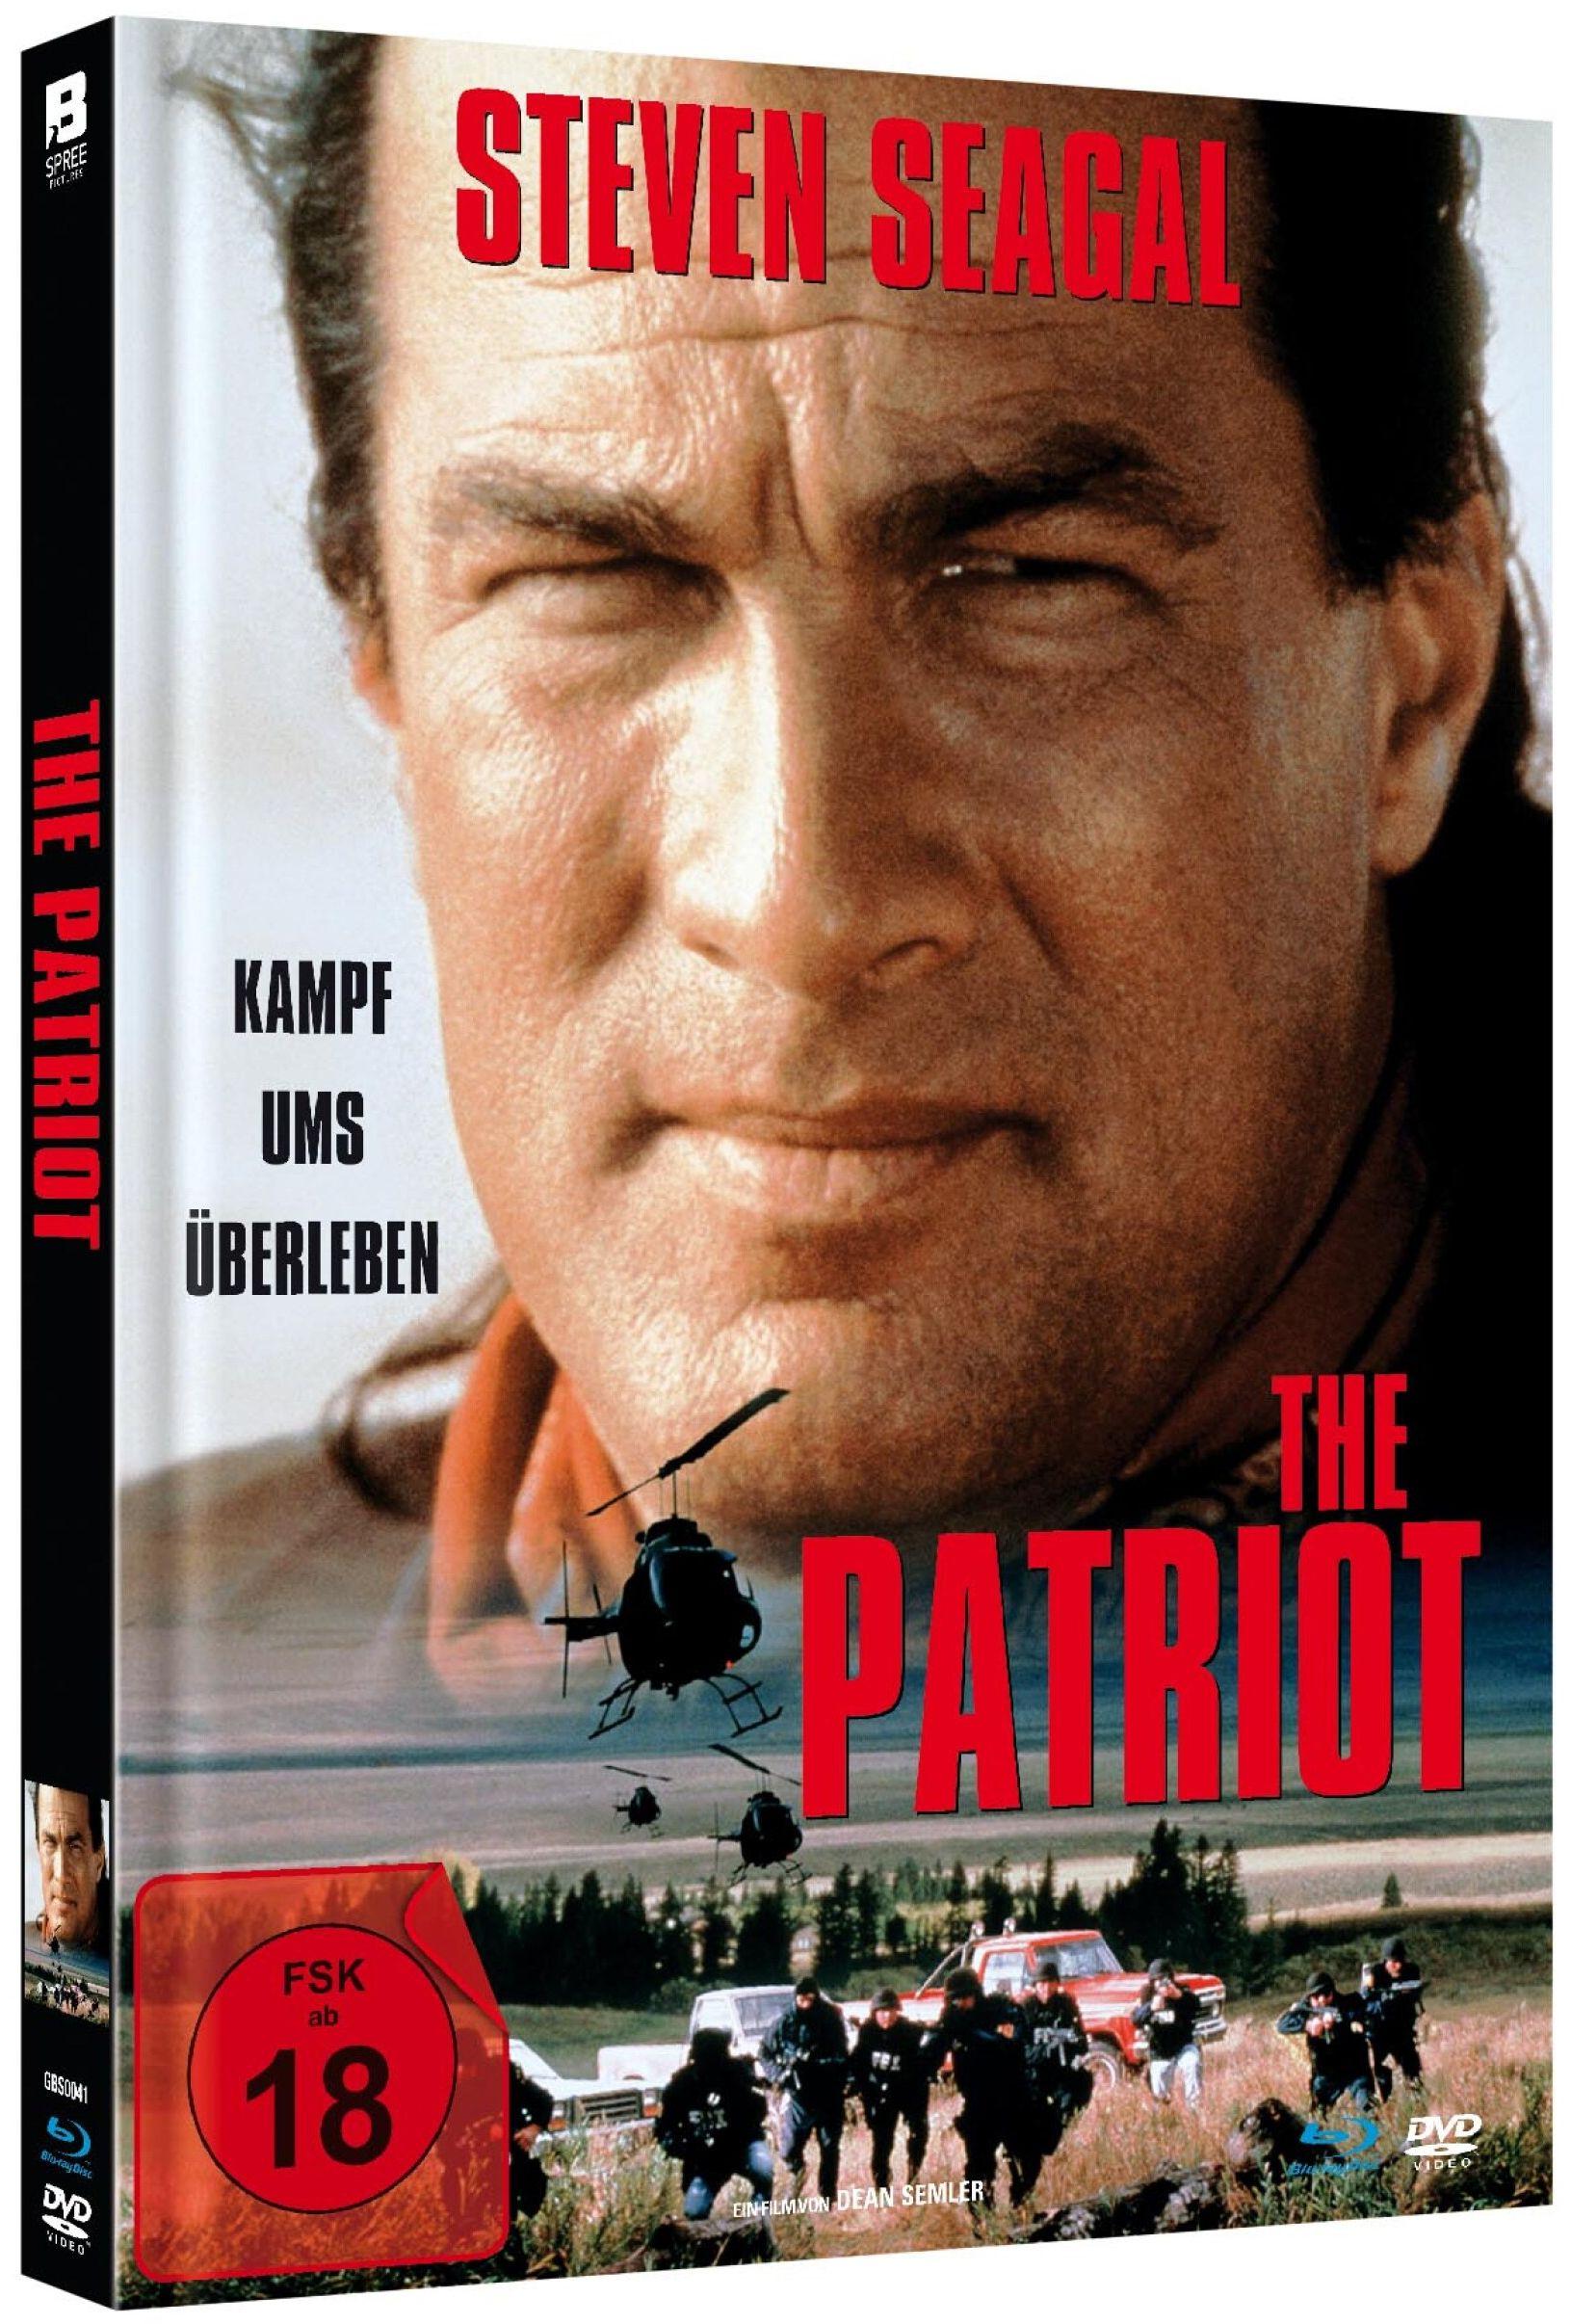 Patriot, The - Kampf ums Überleben (Lim. Uncut Mediabook) (DVD + BLURAY)